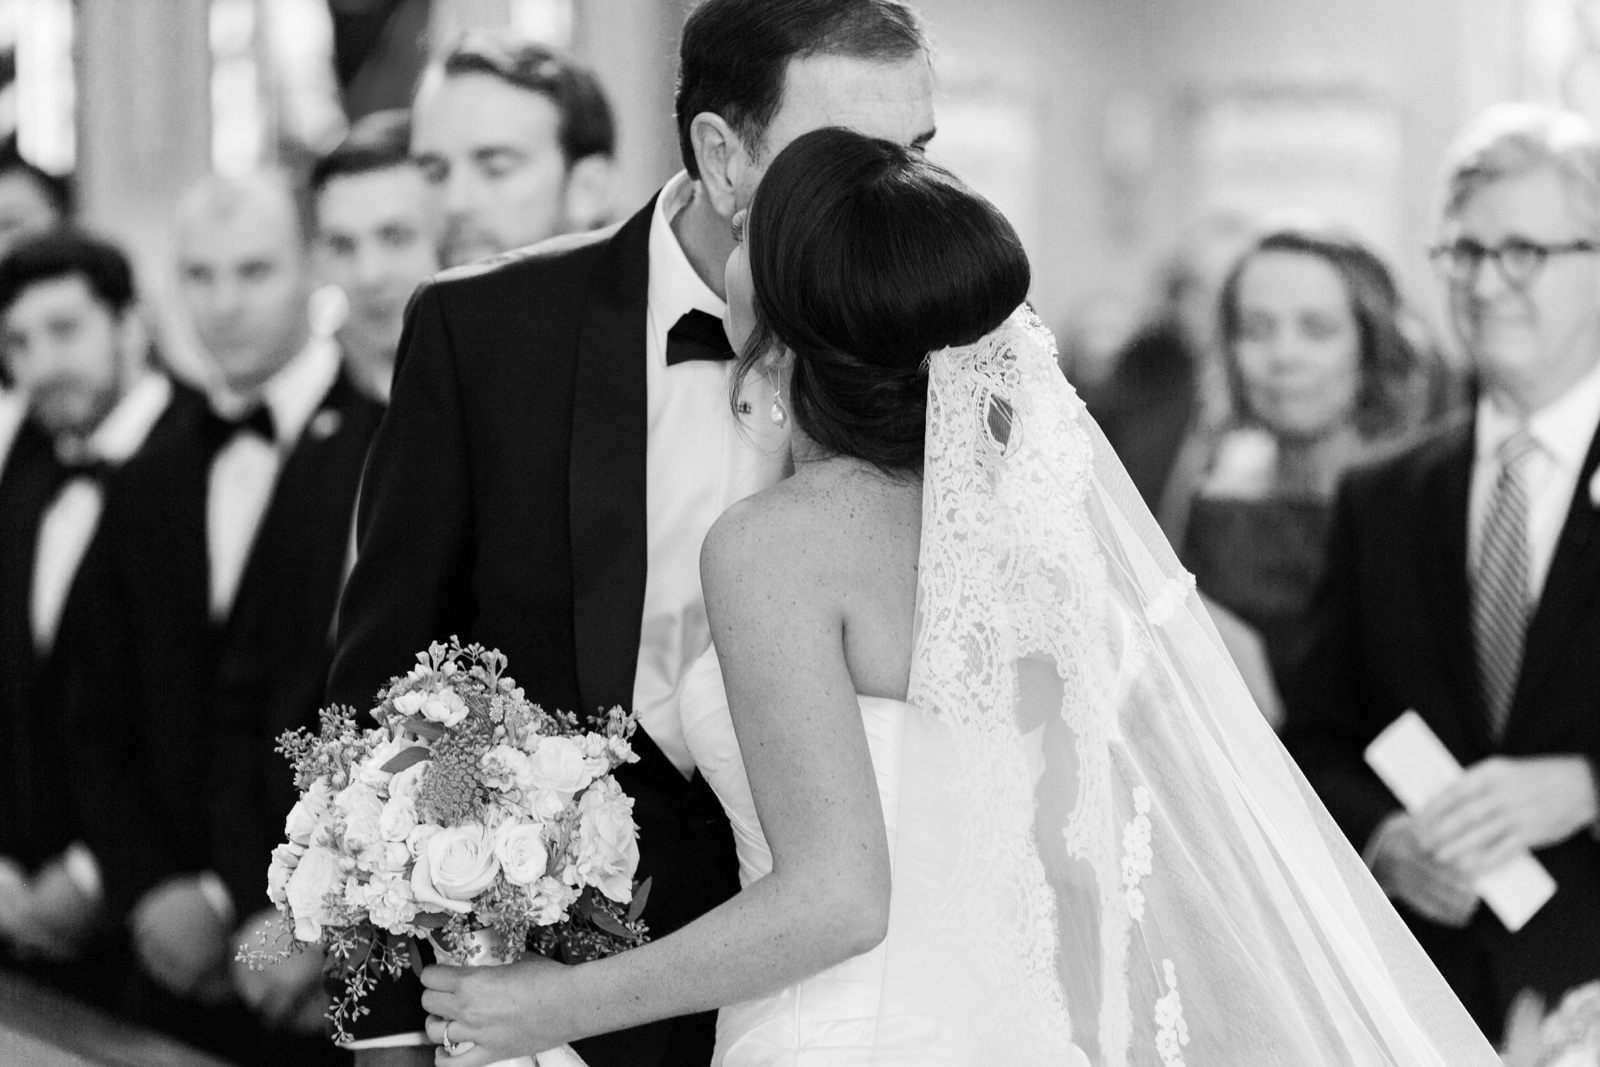 atrium at curtis center wedding photographer philadelphia wedding photographer shannon griffin_0008.jpg